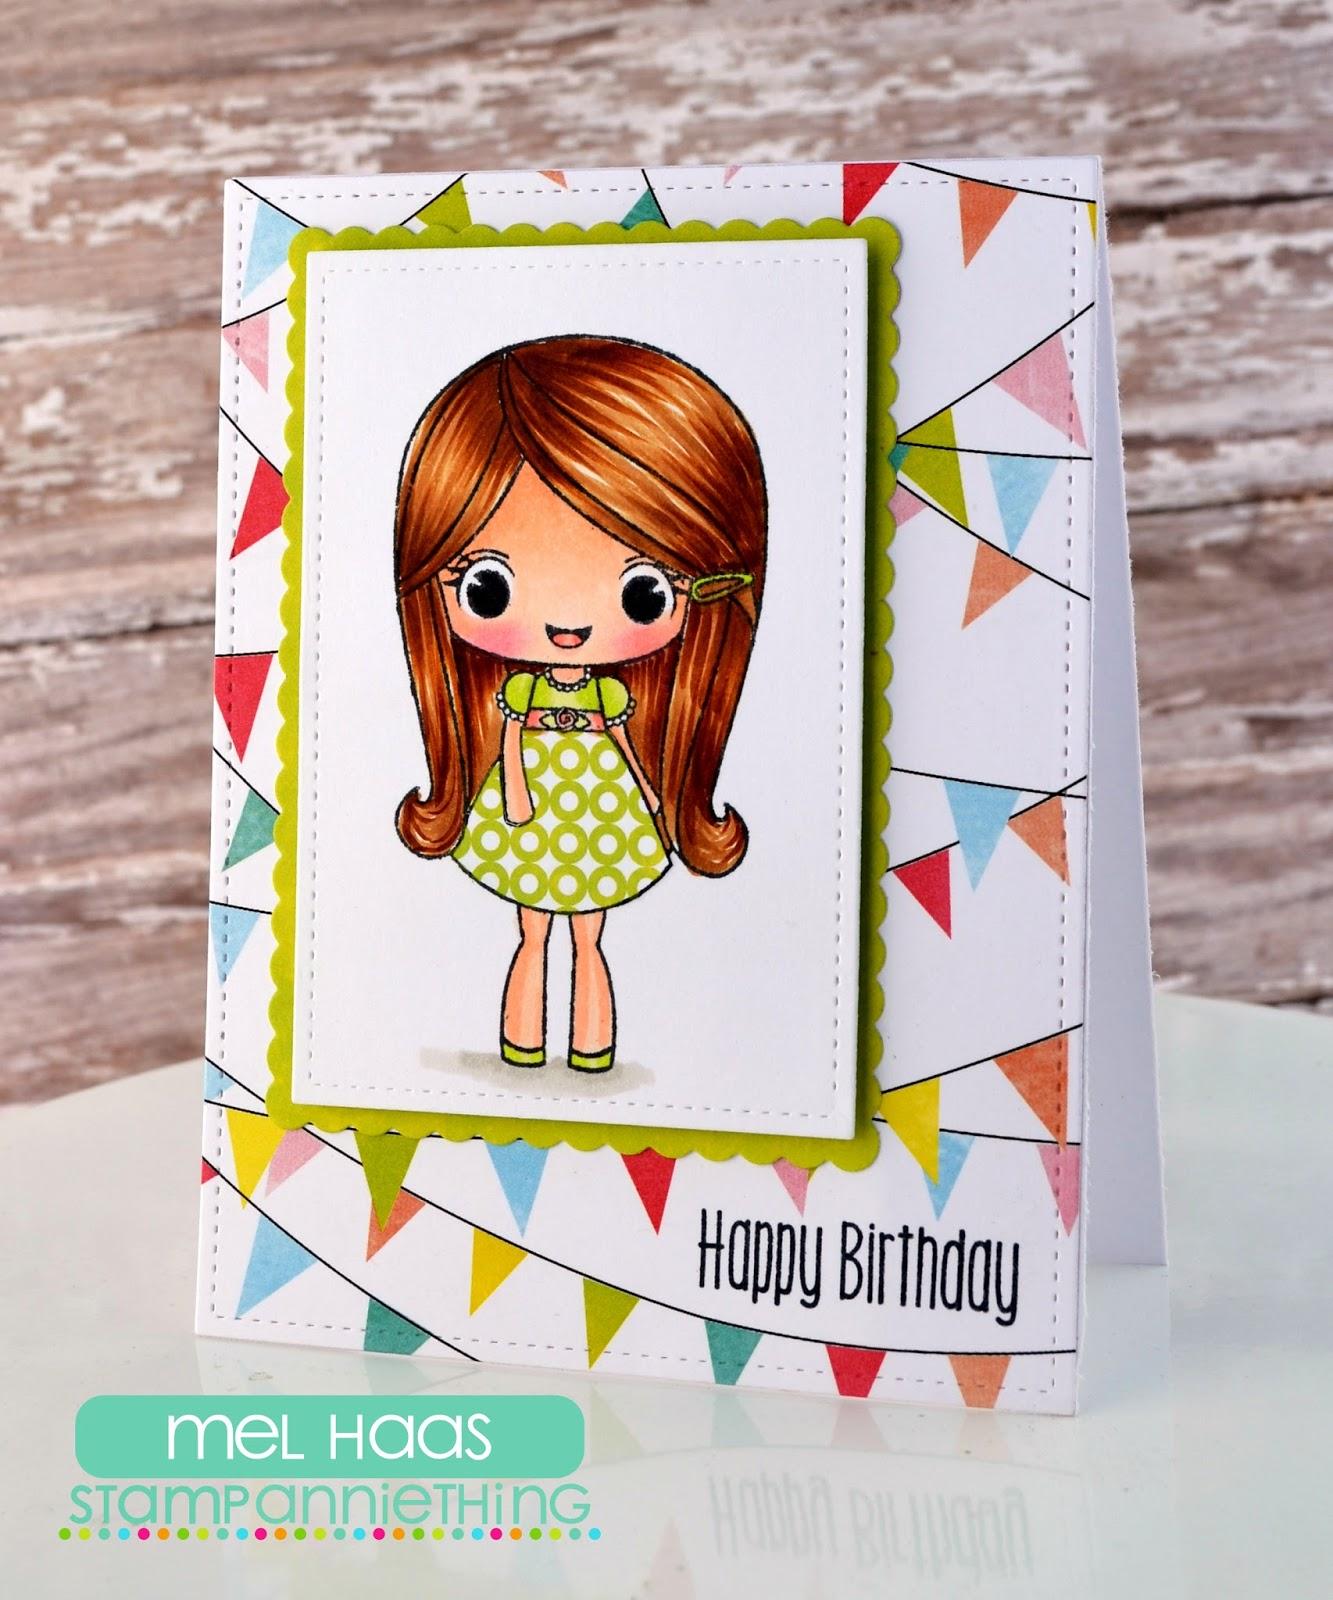 Doxie Mel Designs Birthday Greetings With Melanie